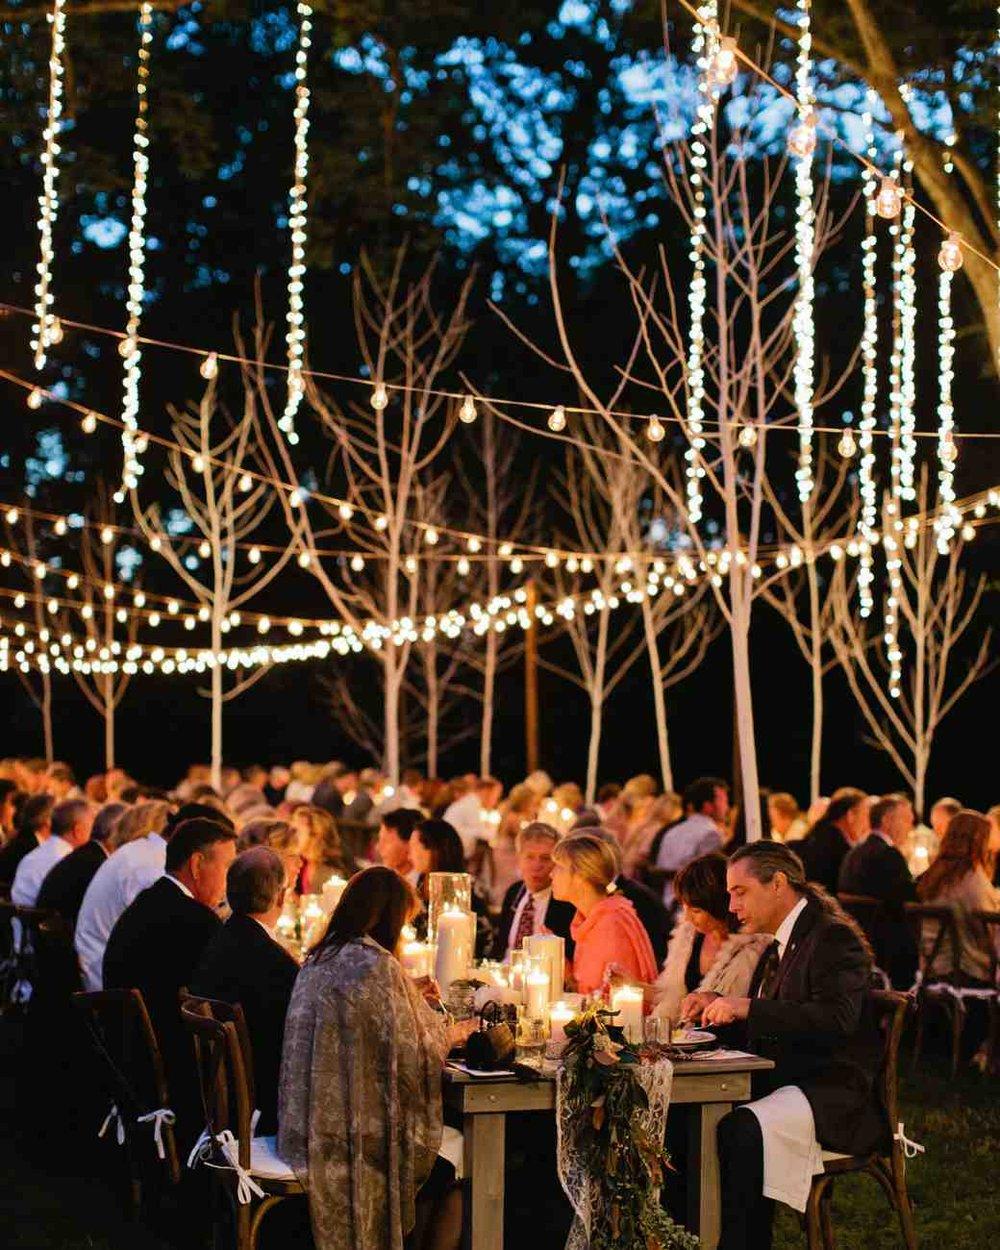 memree-rich-wedding-reception-720-6257086-0217_vert.jpg